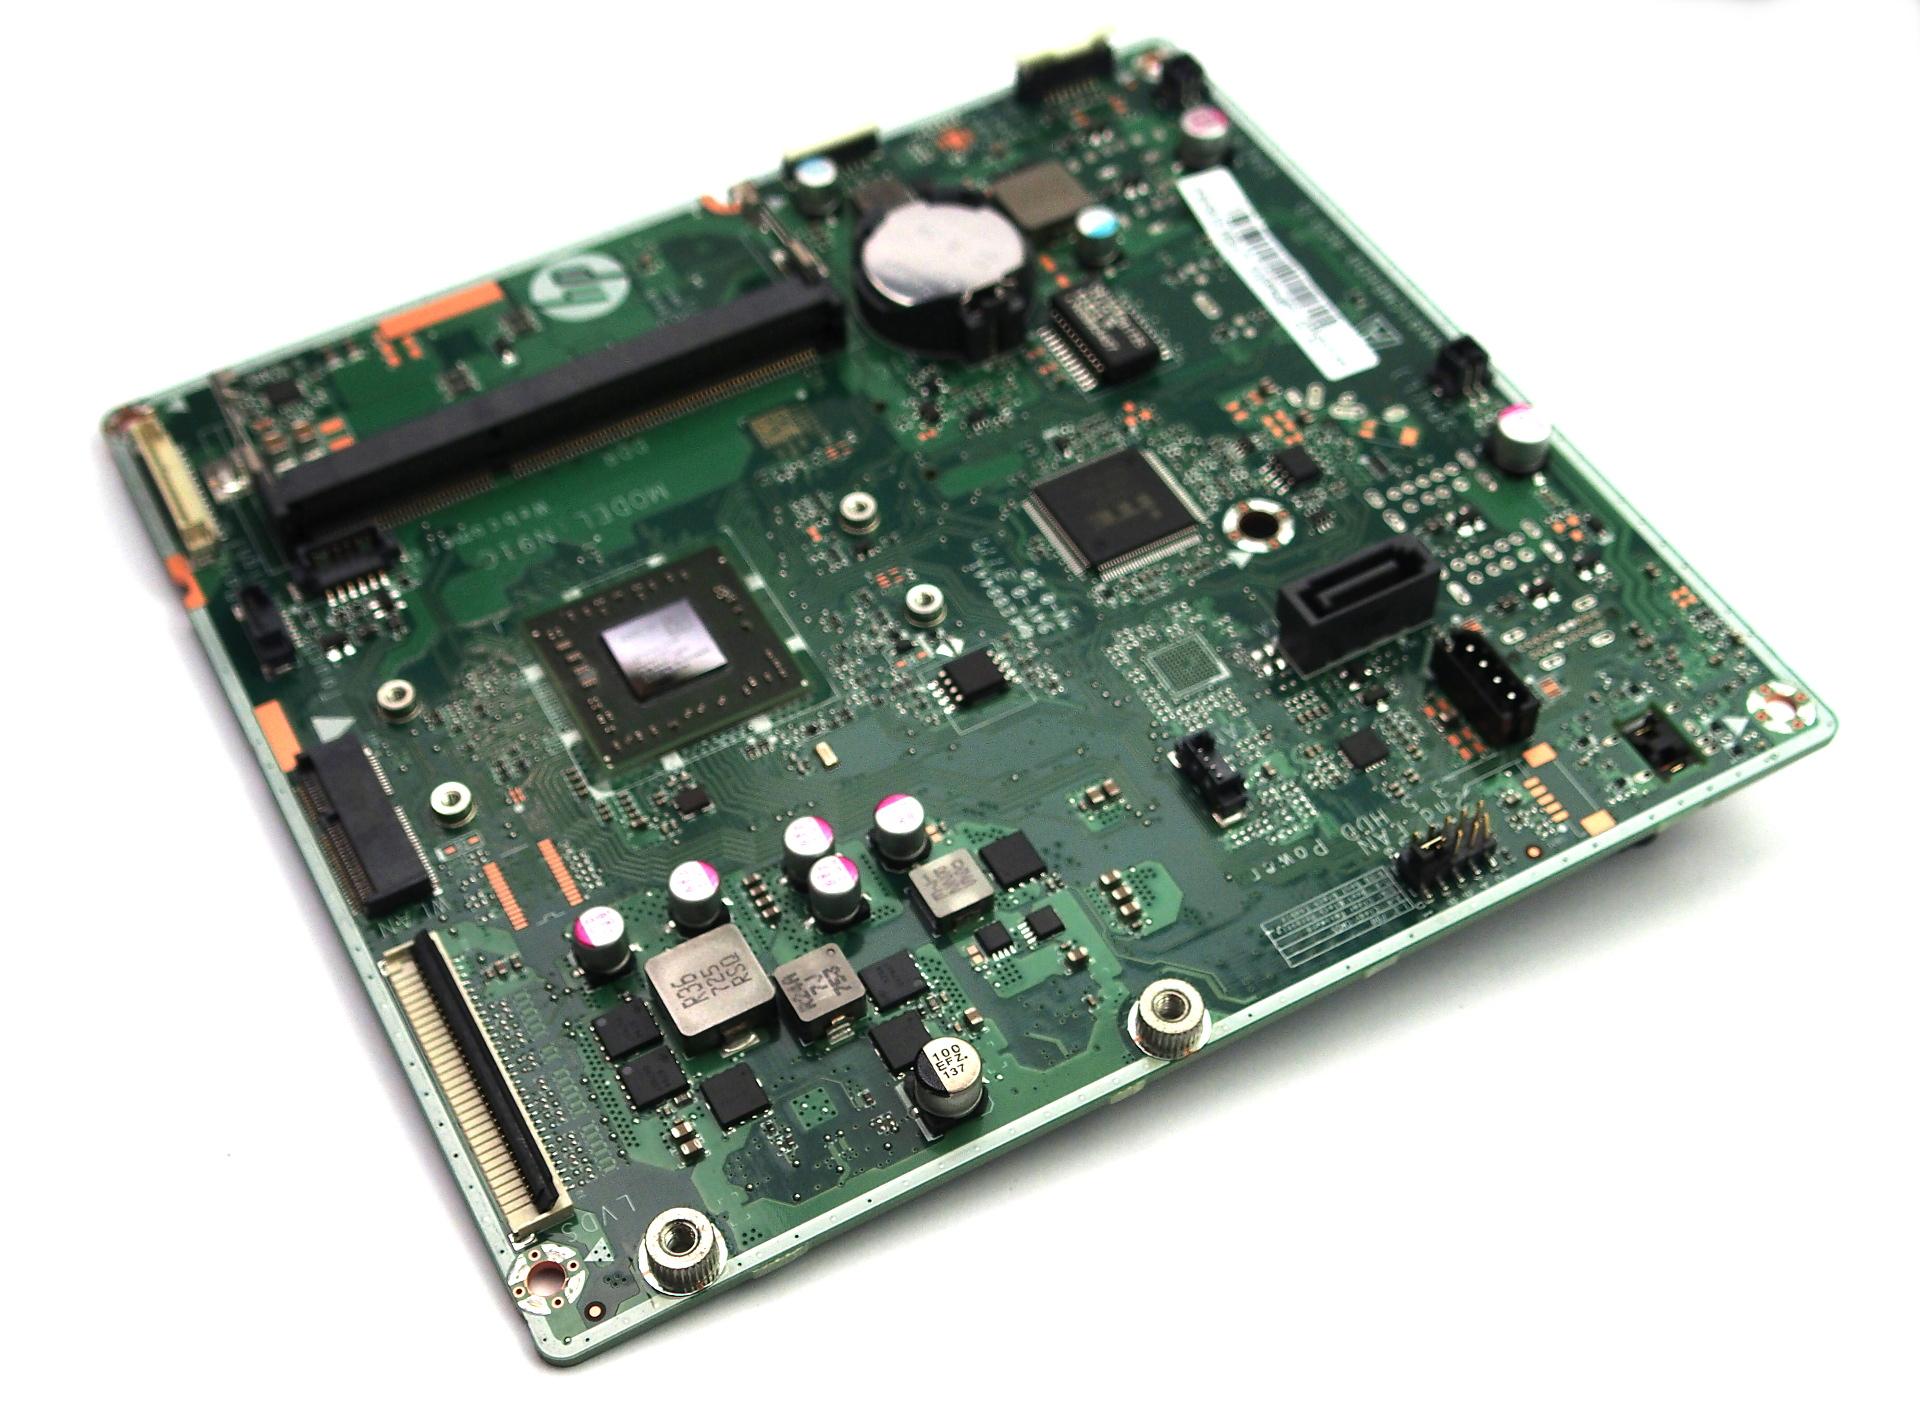 HP 845615-005 Motherboard f/ 24-g080na AiO PC w/ BGA AMD A8-7410 CPU